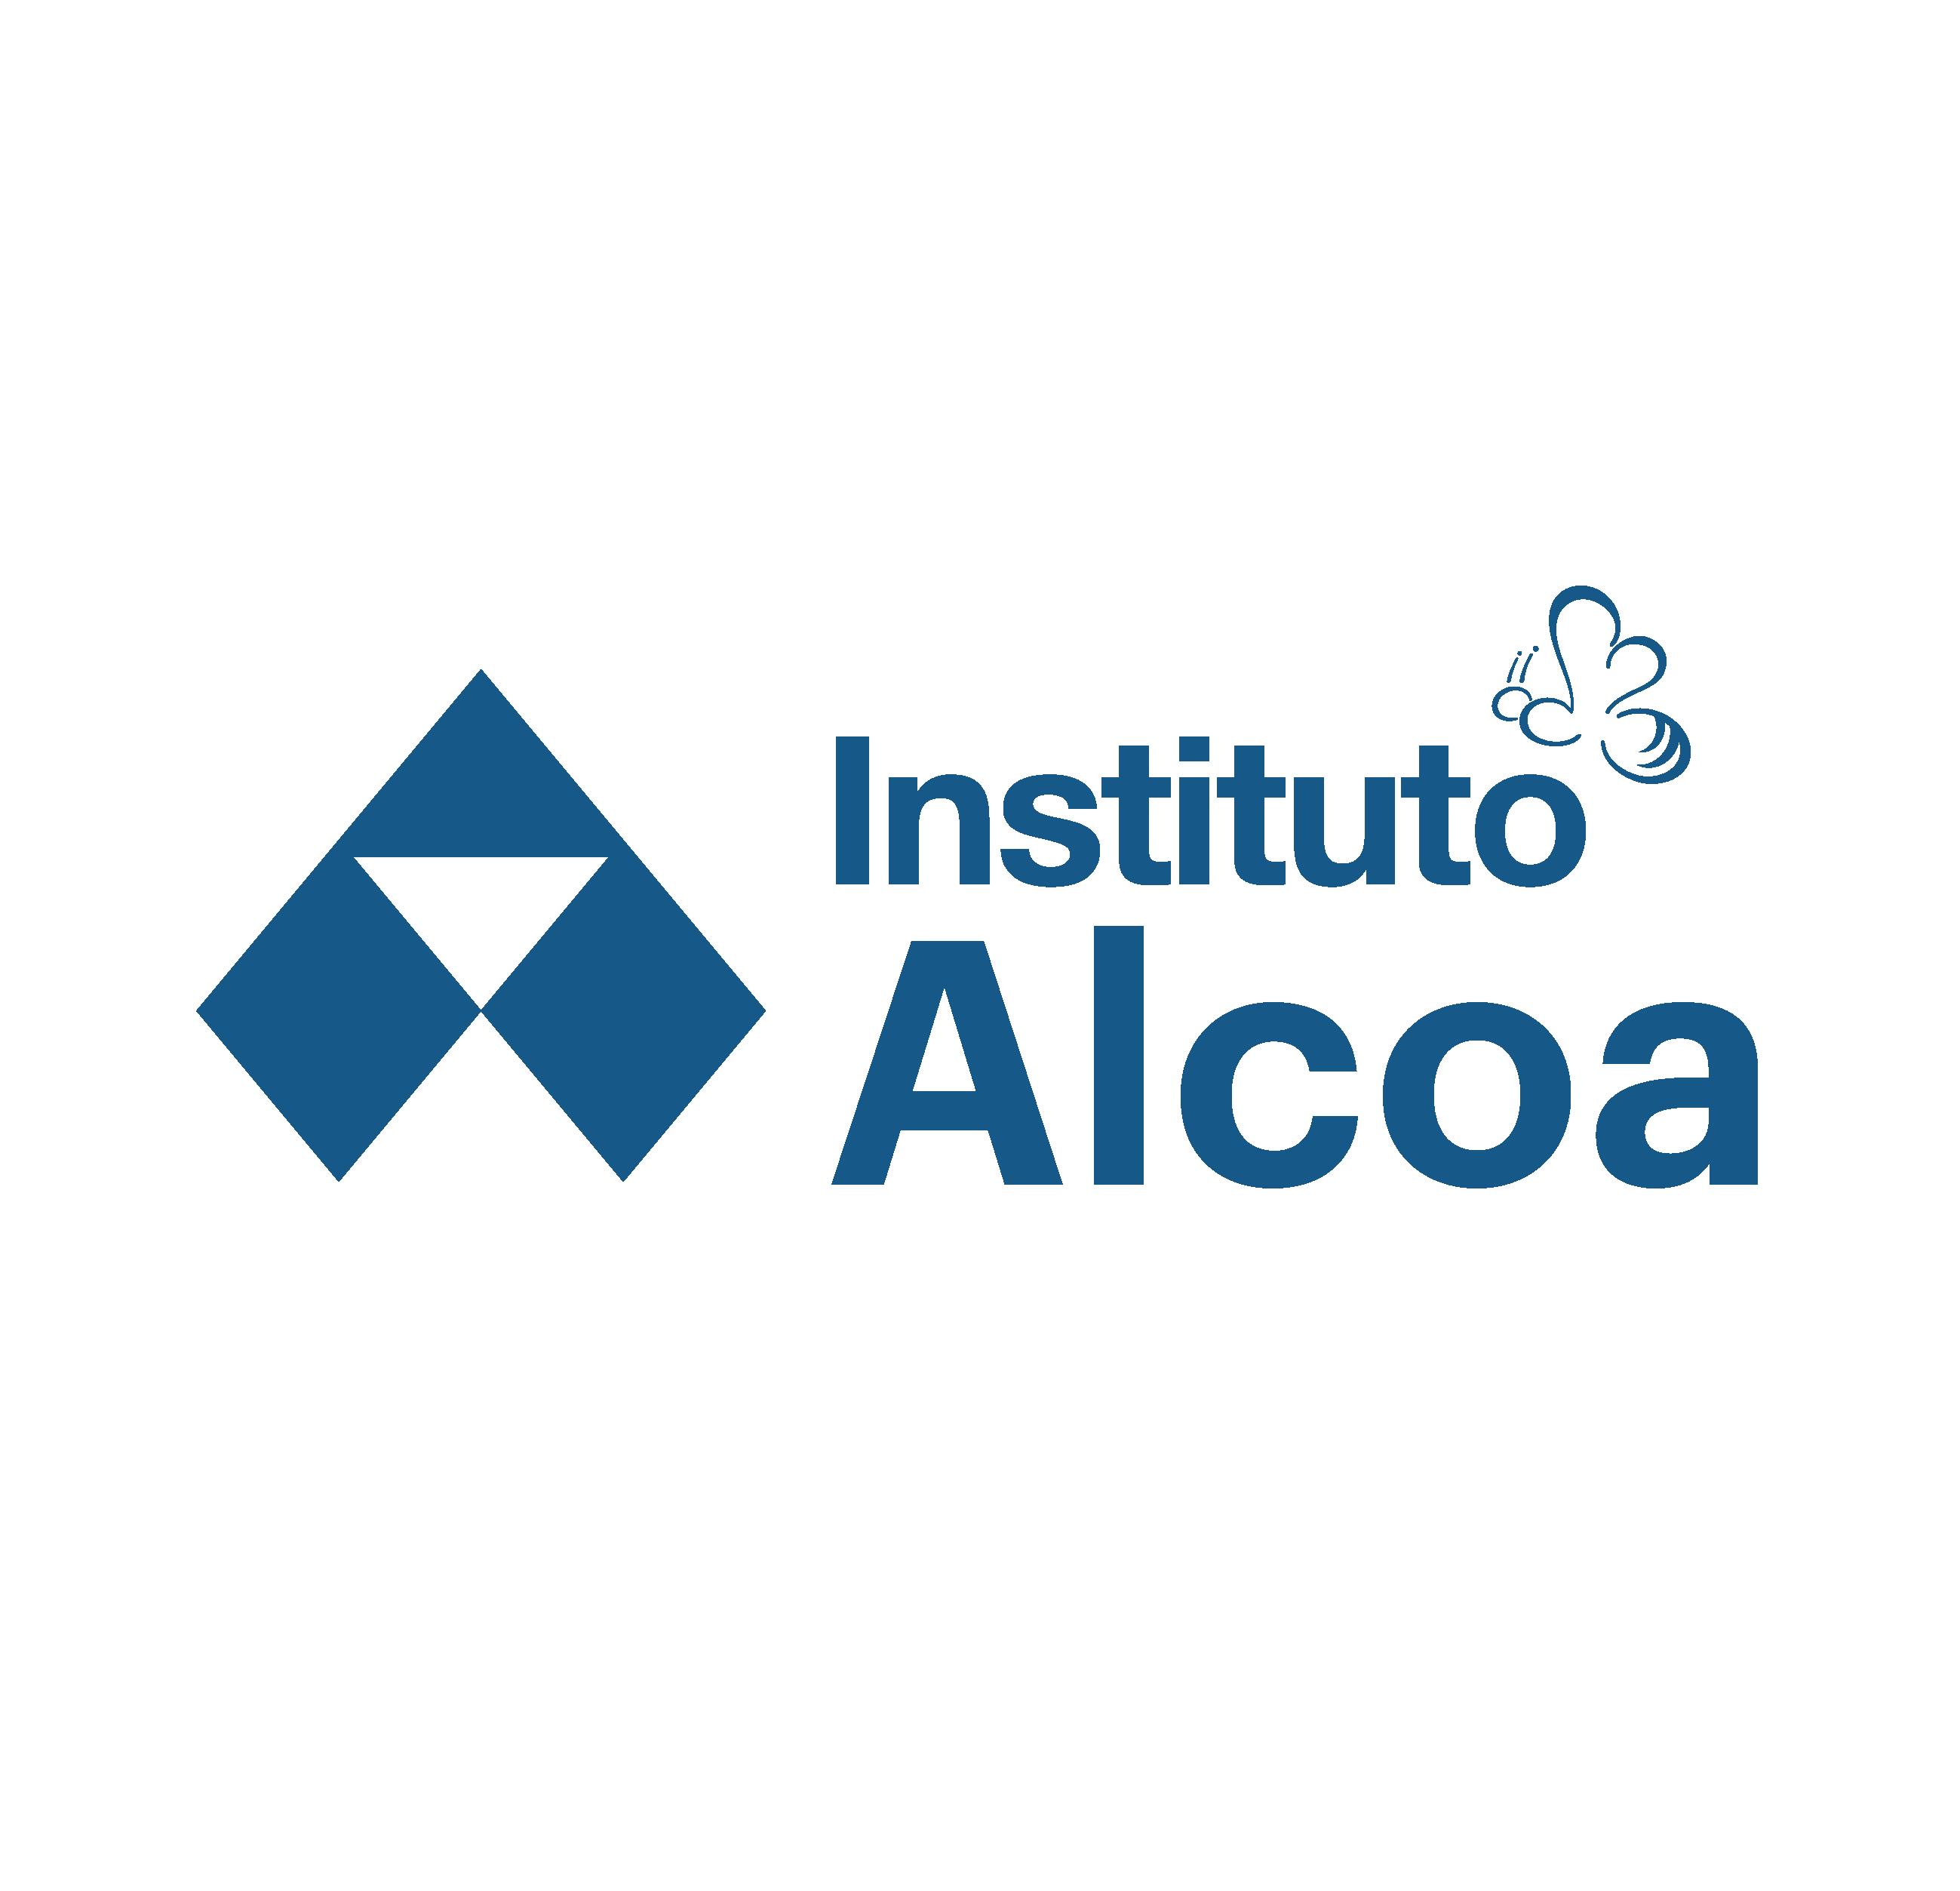 (Português) Instituto Alcoa